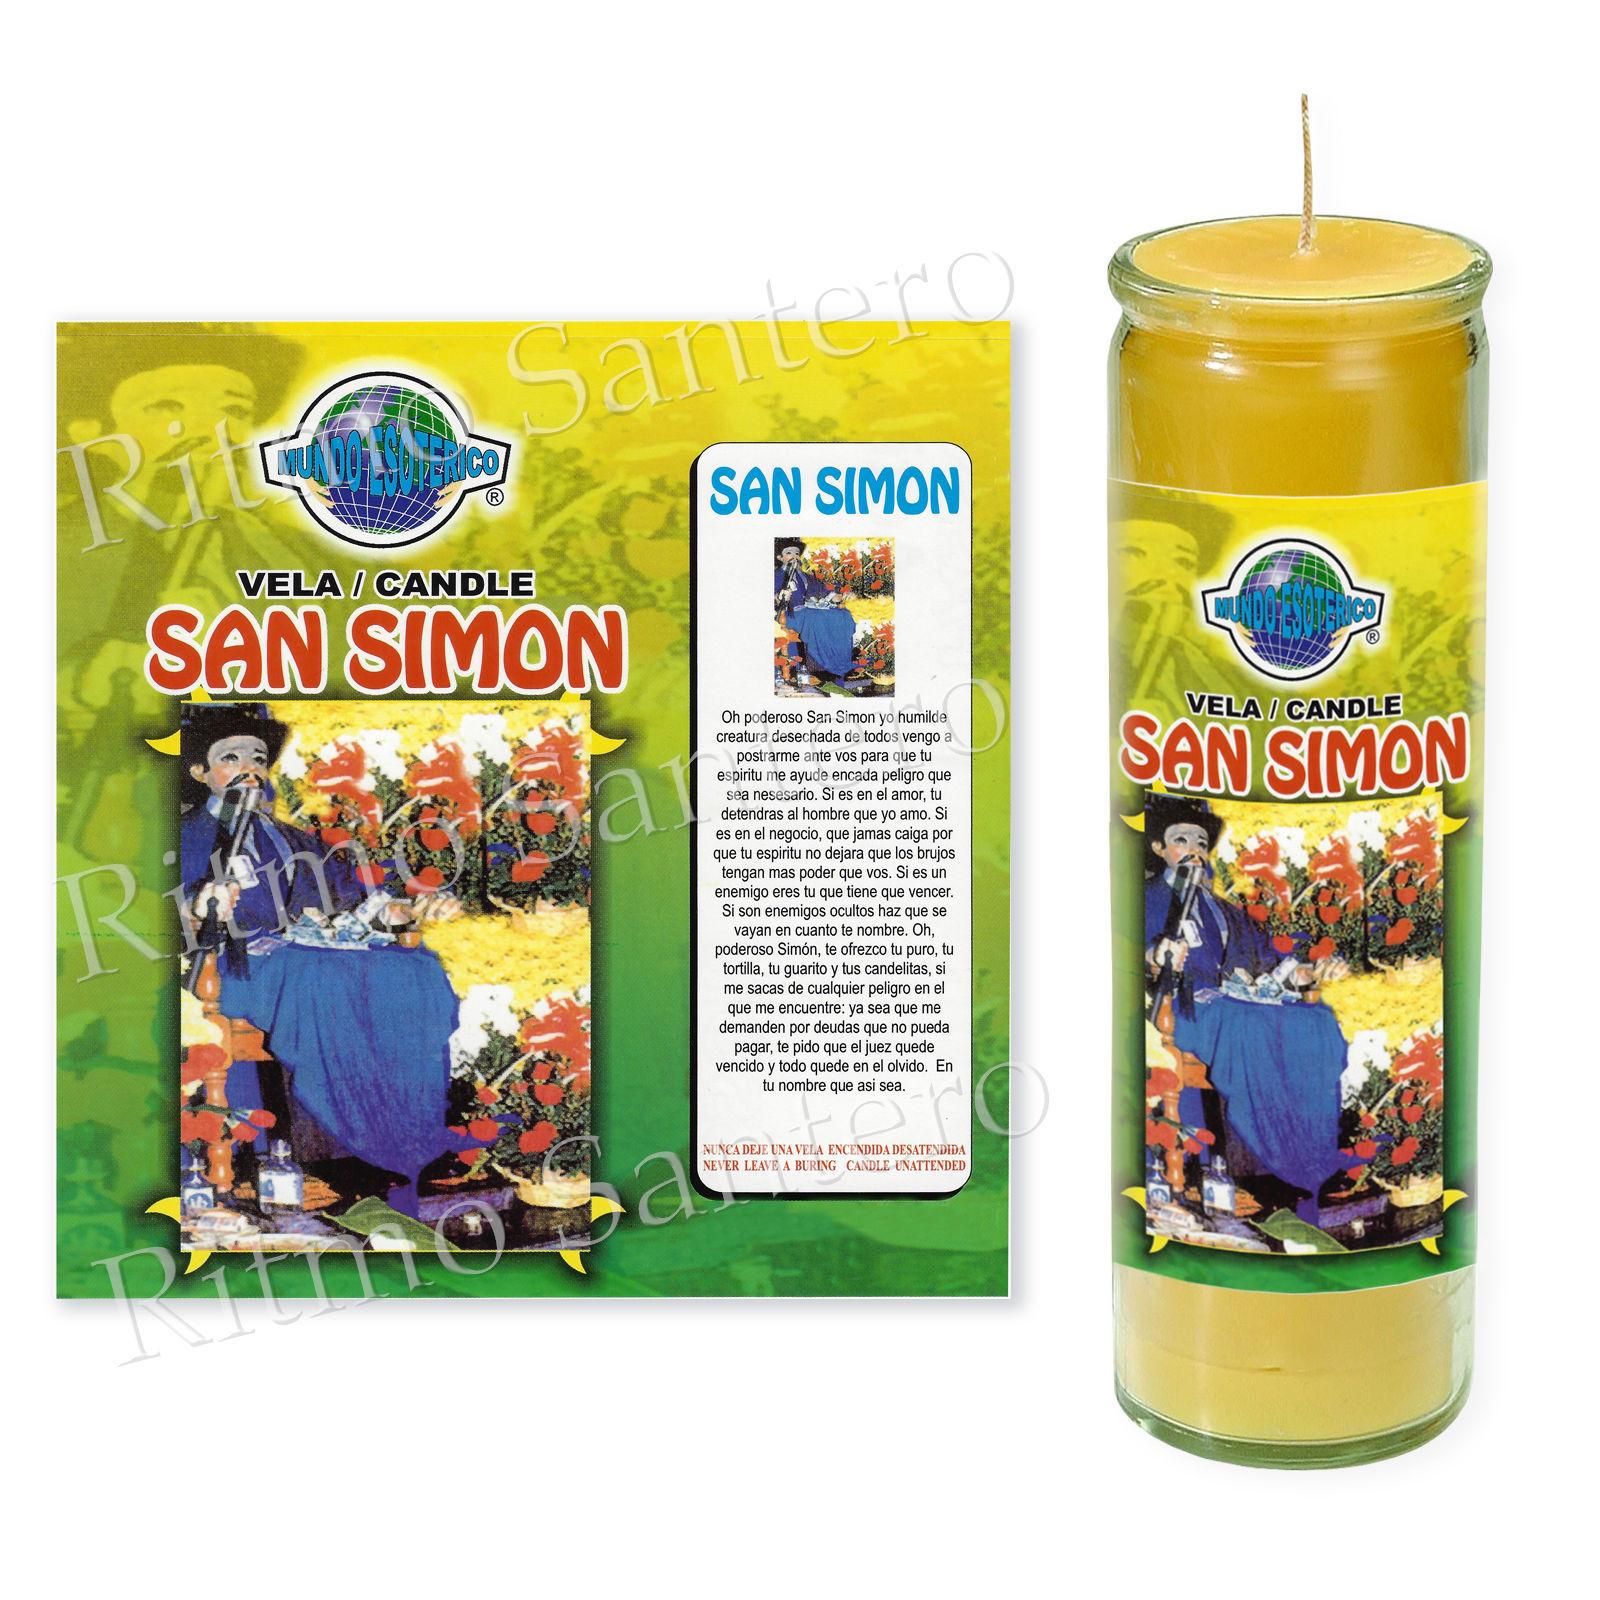 Click picture to enlarge - Etiquetas para velas ...